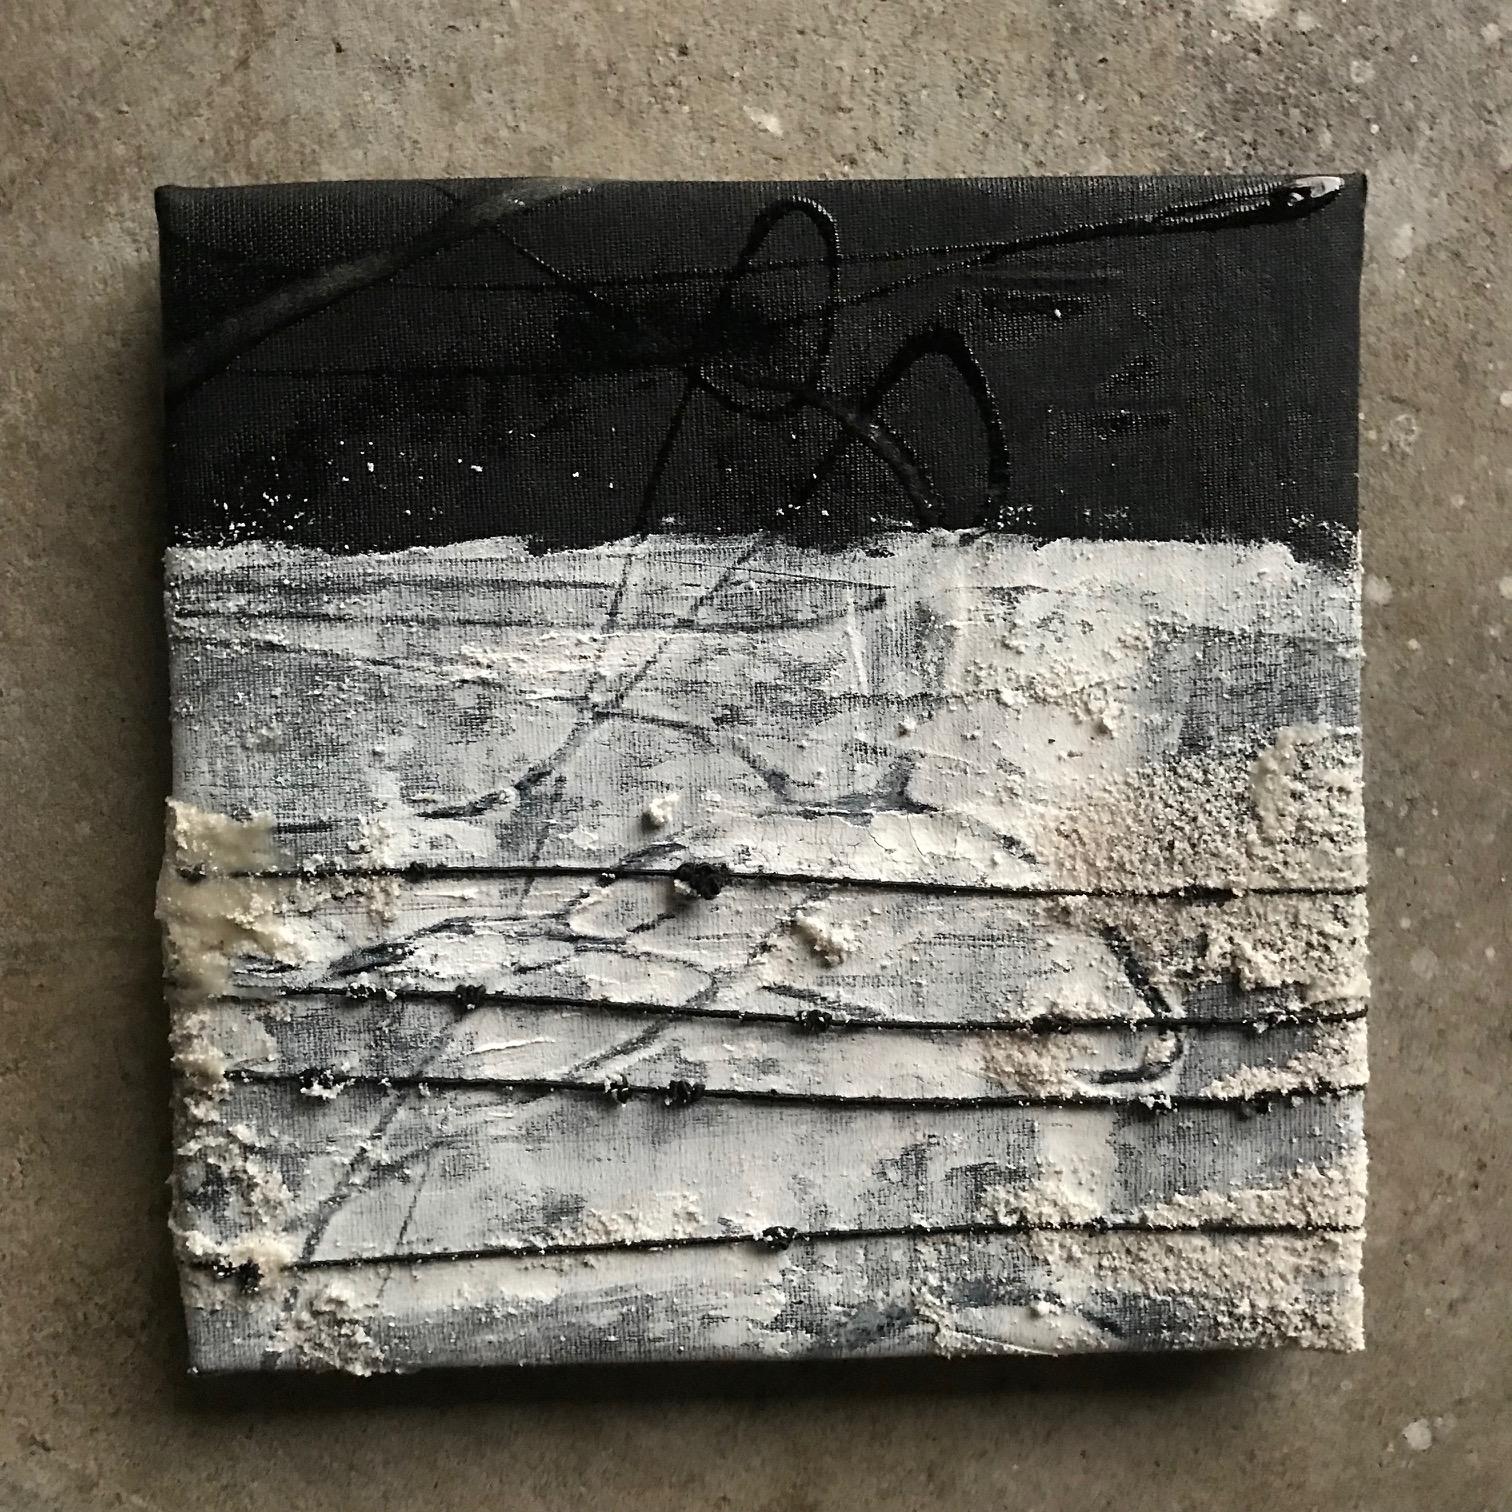 "Artifact (confinement) - 8"" x 8"" (2018)"